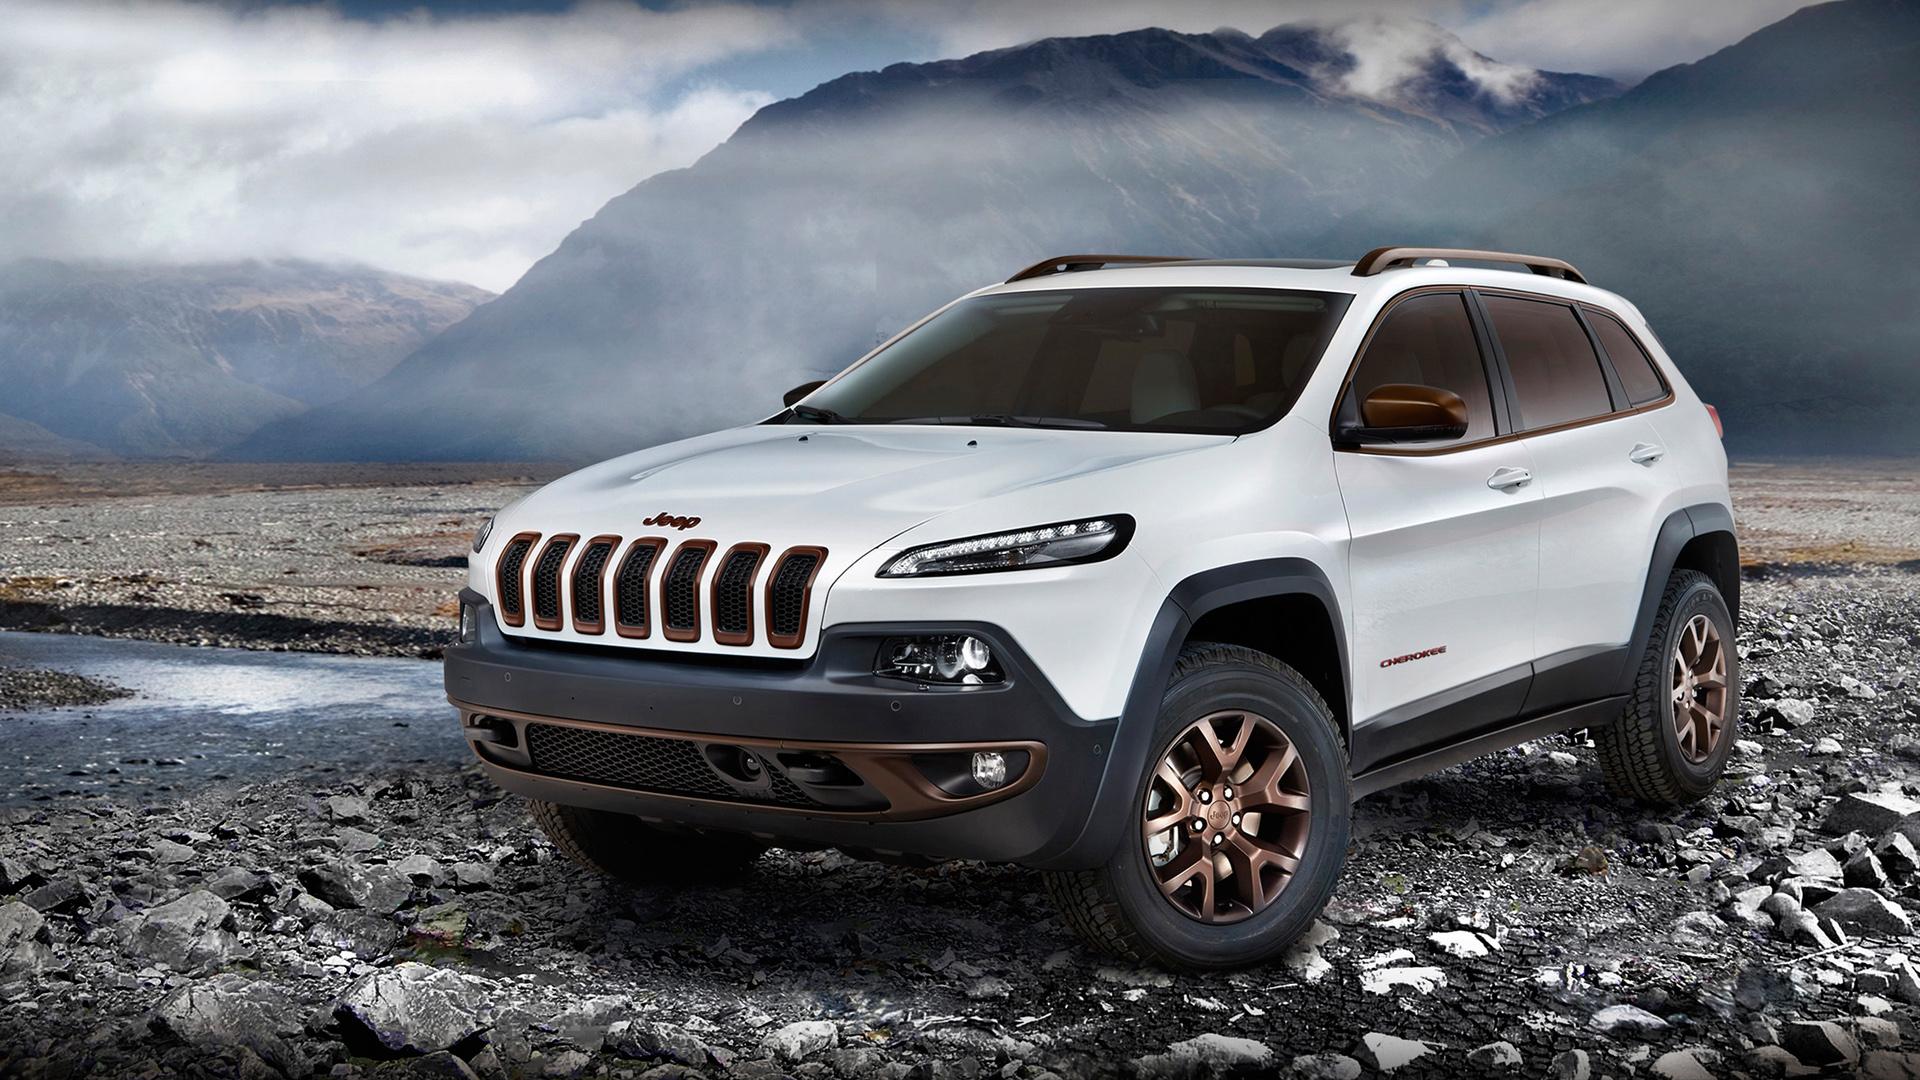 2014 Jeep Cherokee Sageland Concept Wallpaper HD Car Wallpapers 1920x1080